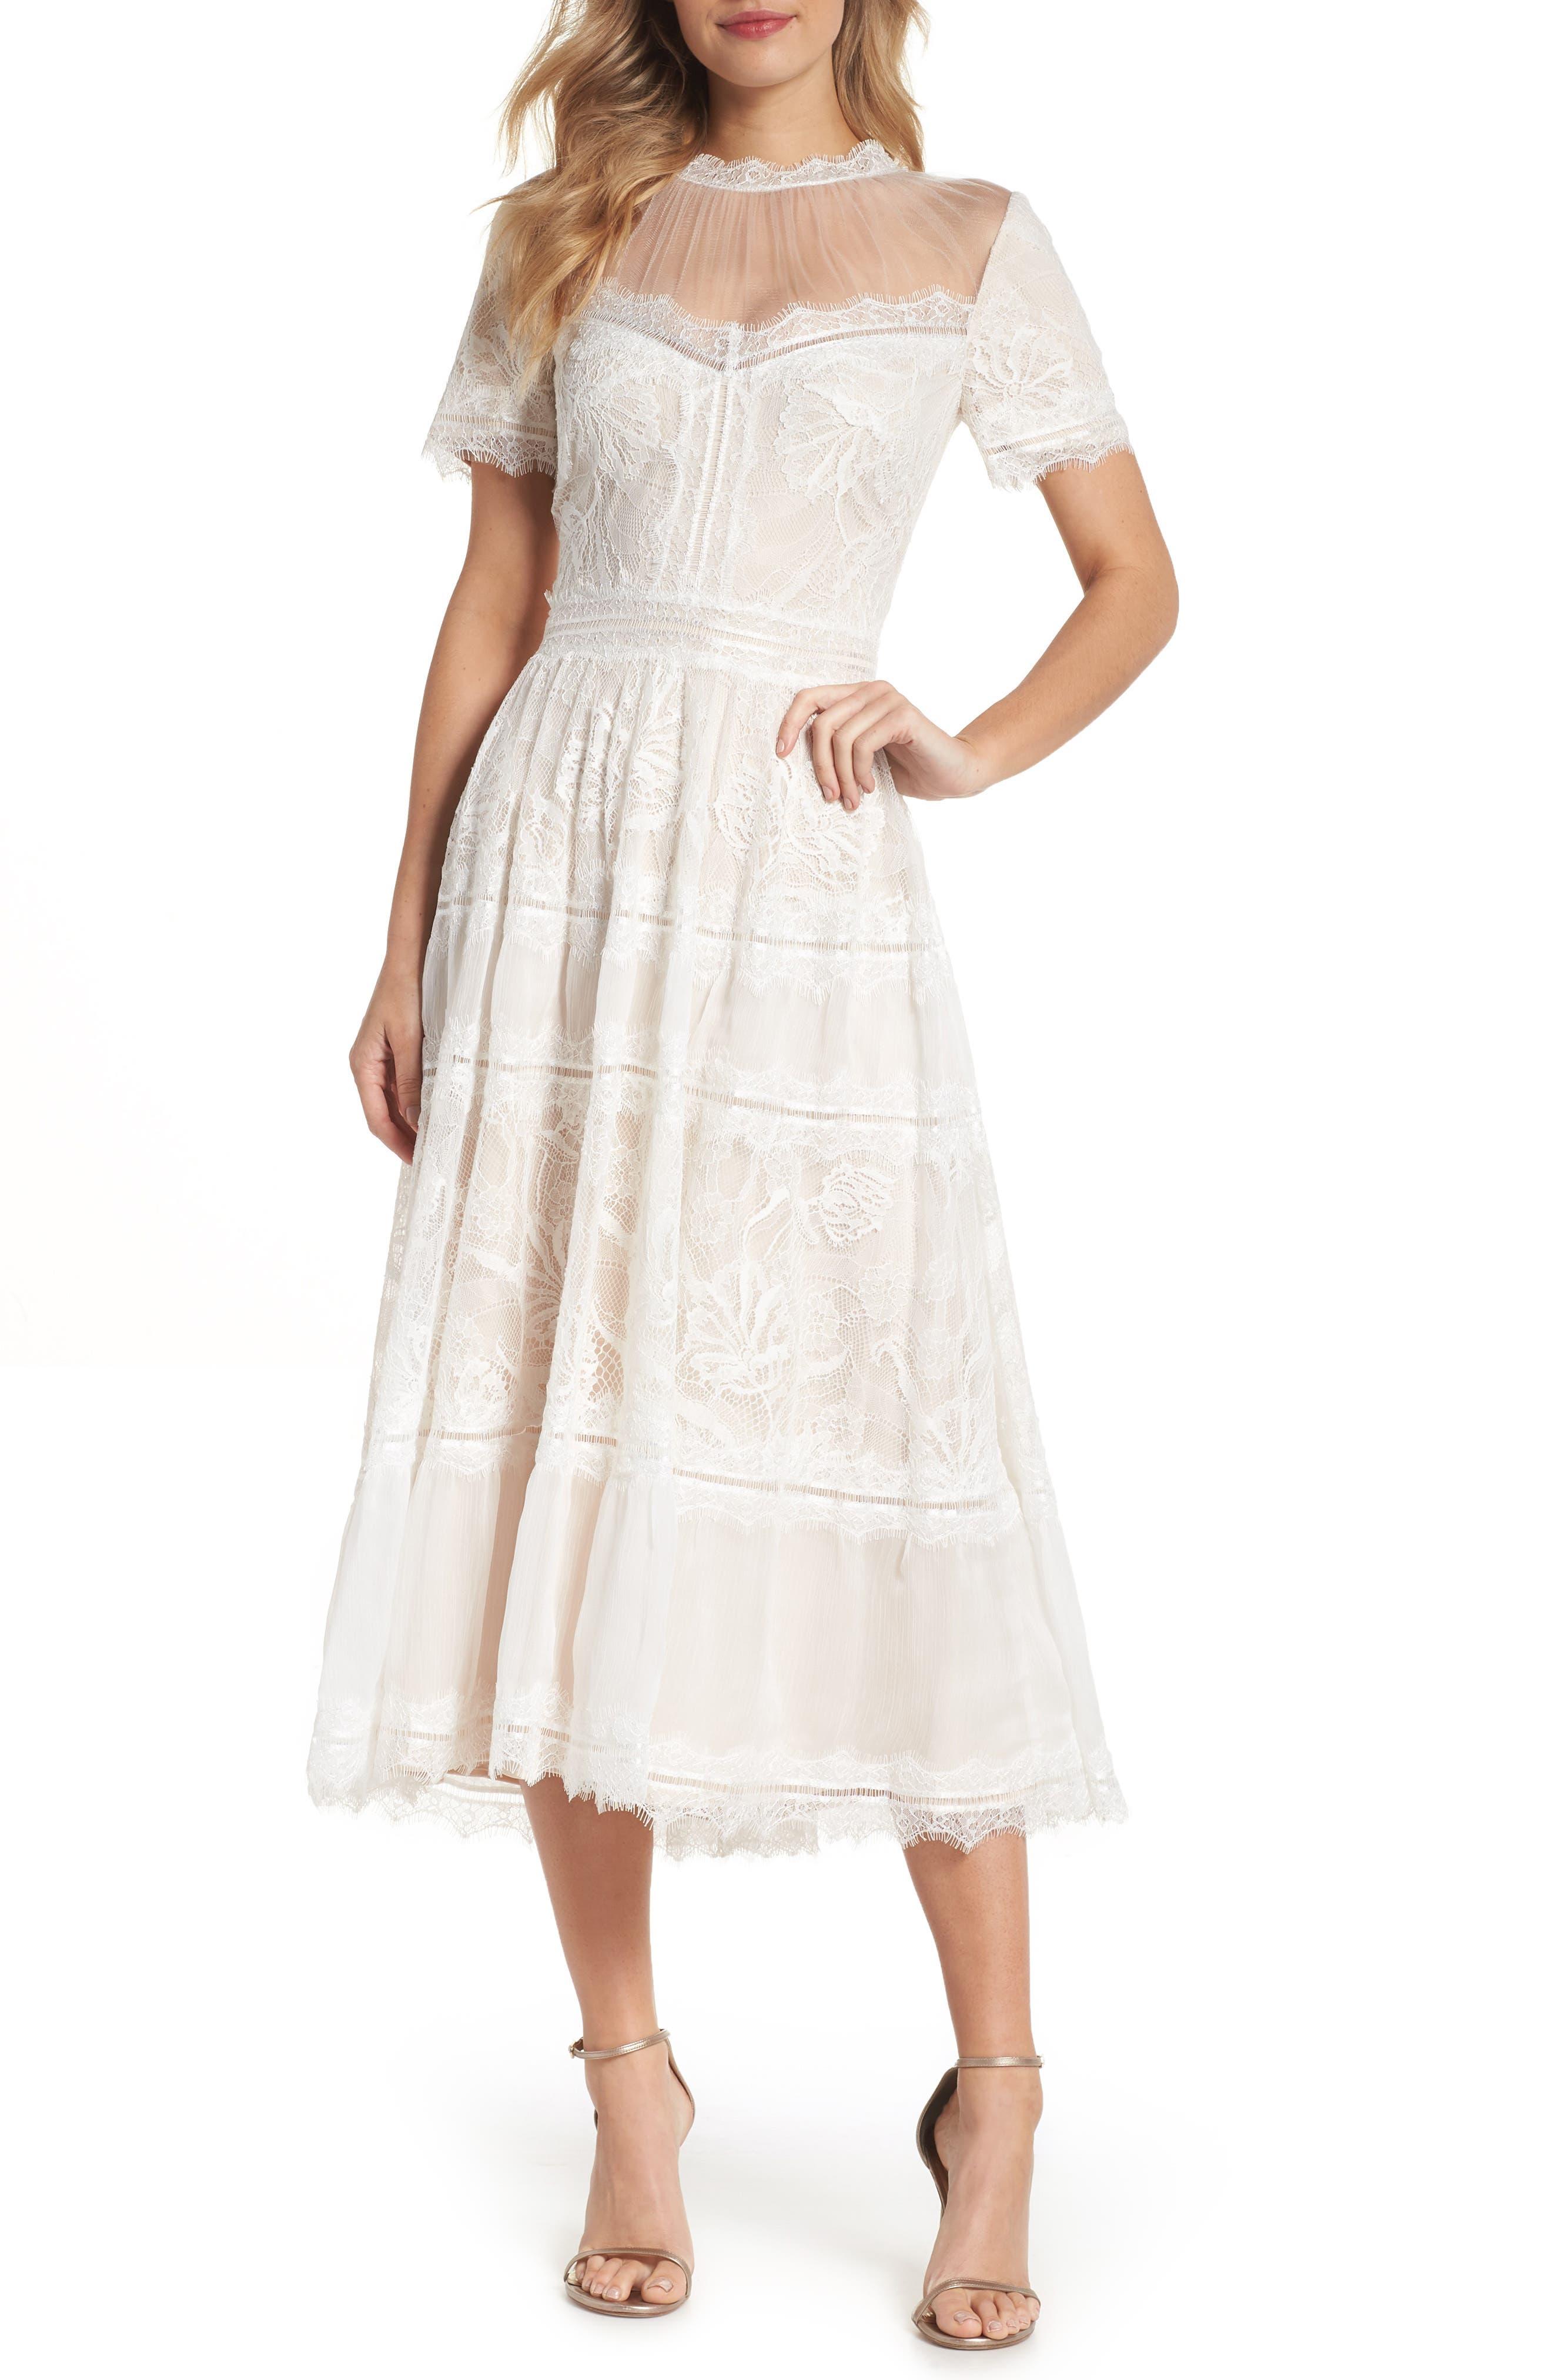 Lace Tea-Length Dress,                             Main thumbnail 1, color,                             Ivory/ Petal